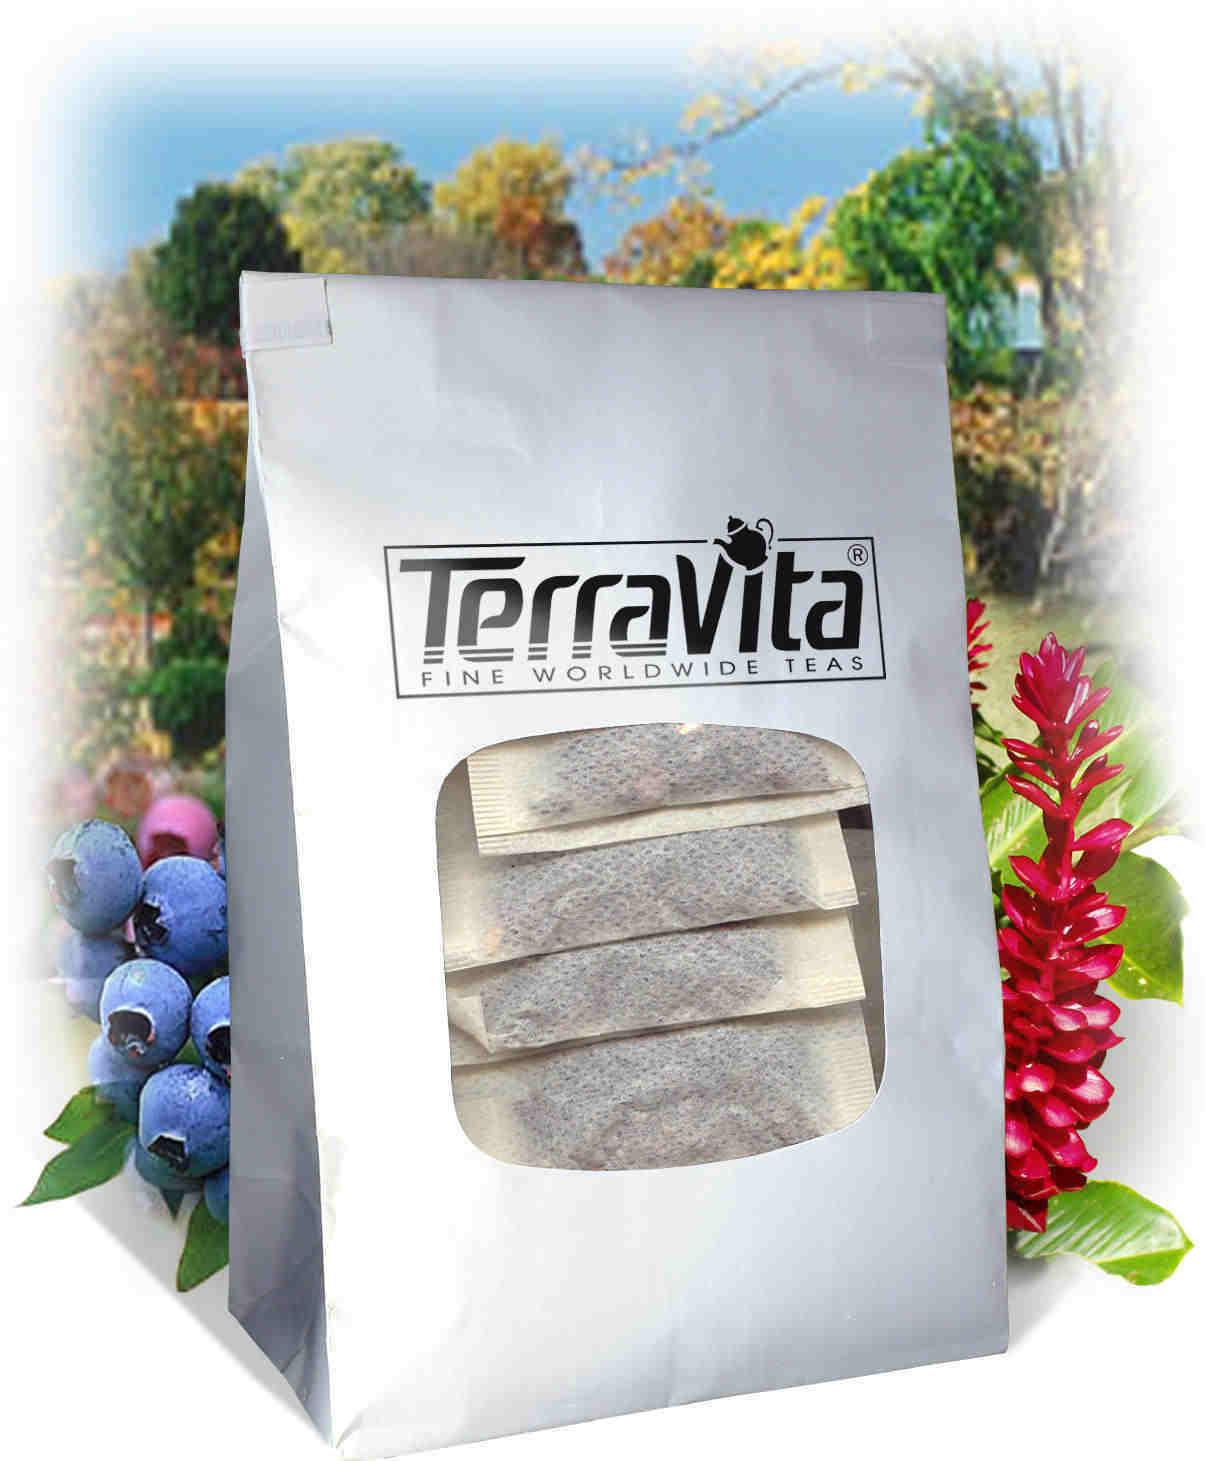 Echinacea Purpurea Root (Certified Organic) Tea